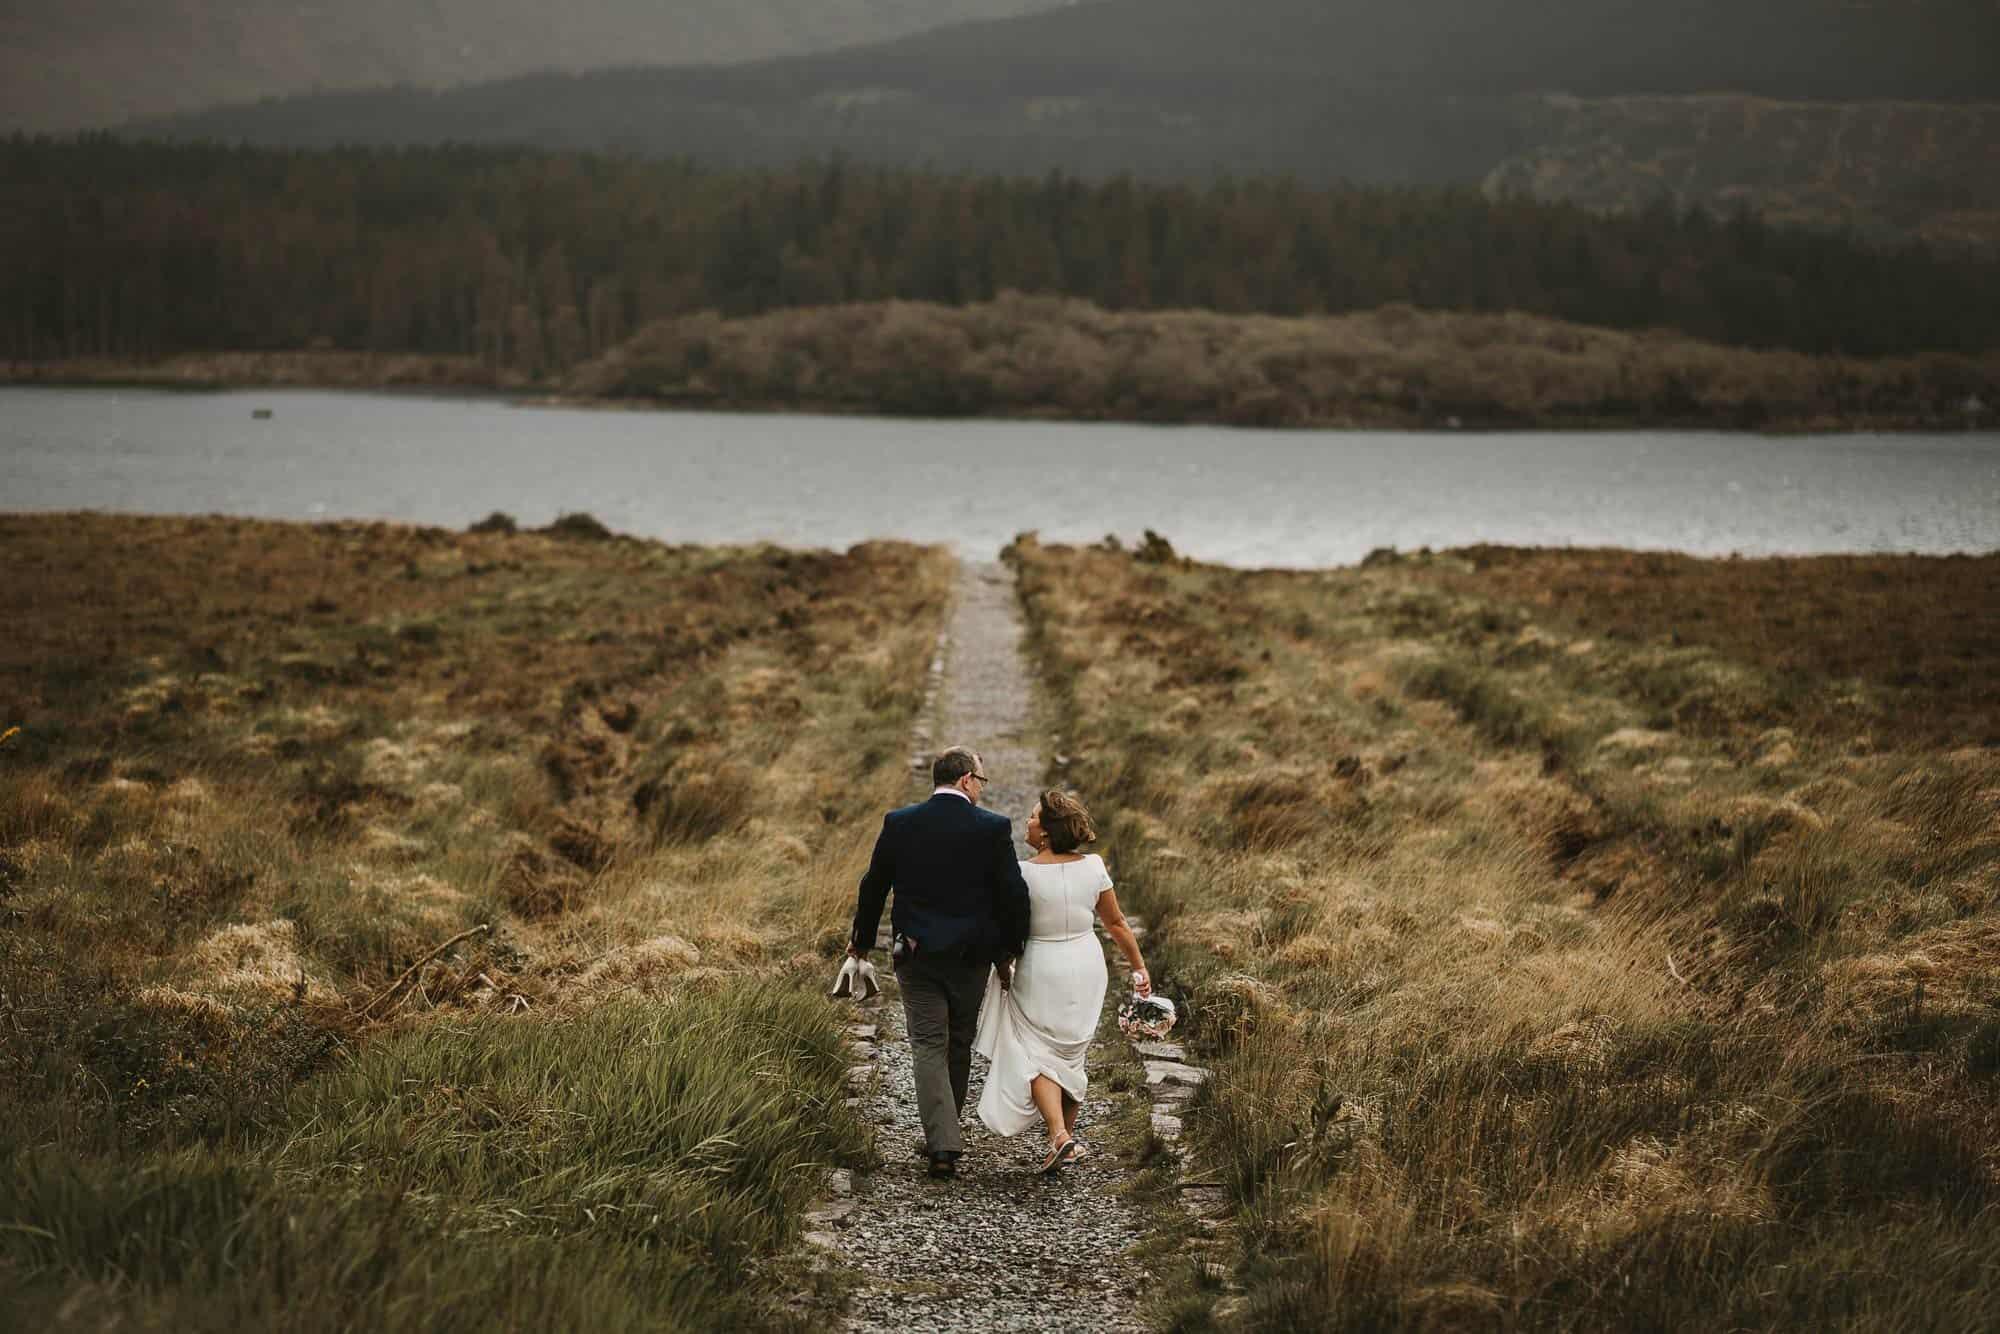 Planning for Elopements in Ireland Barefoot Bride